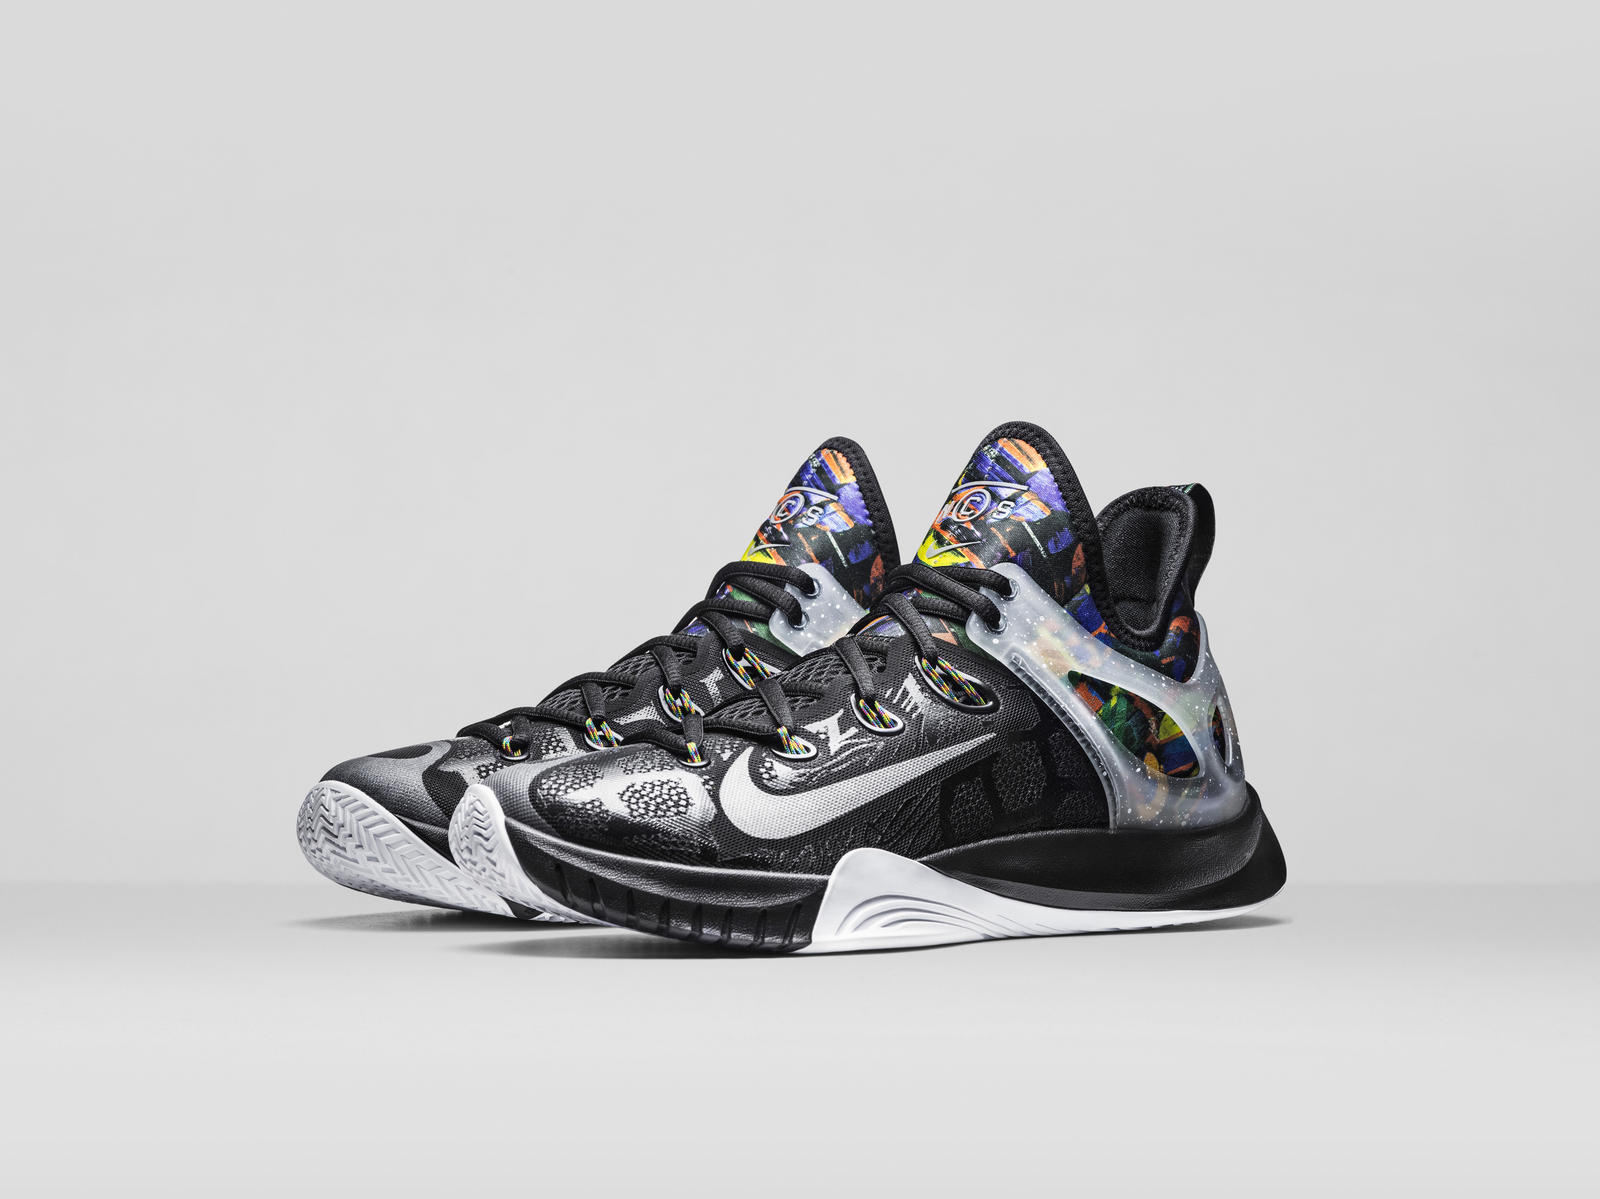 Nike Net Collectors Society HyperRev pair